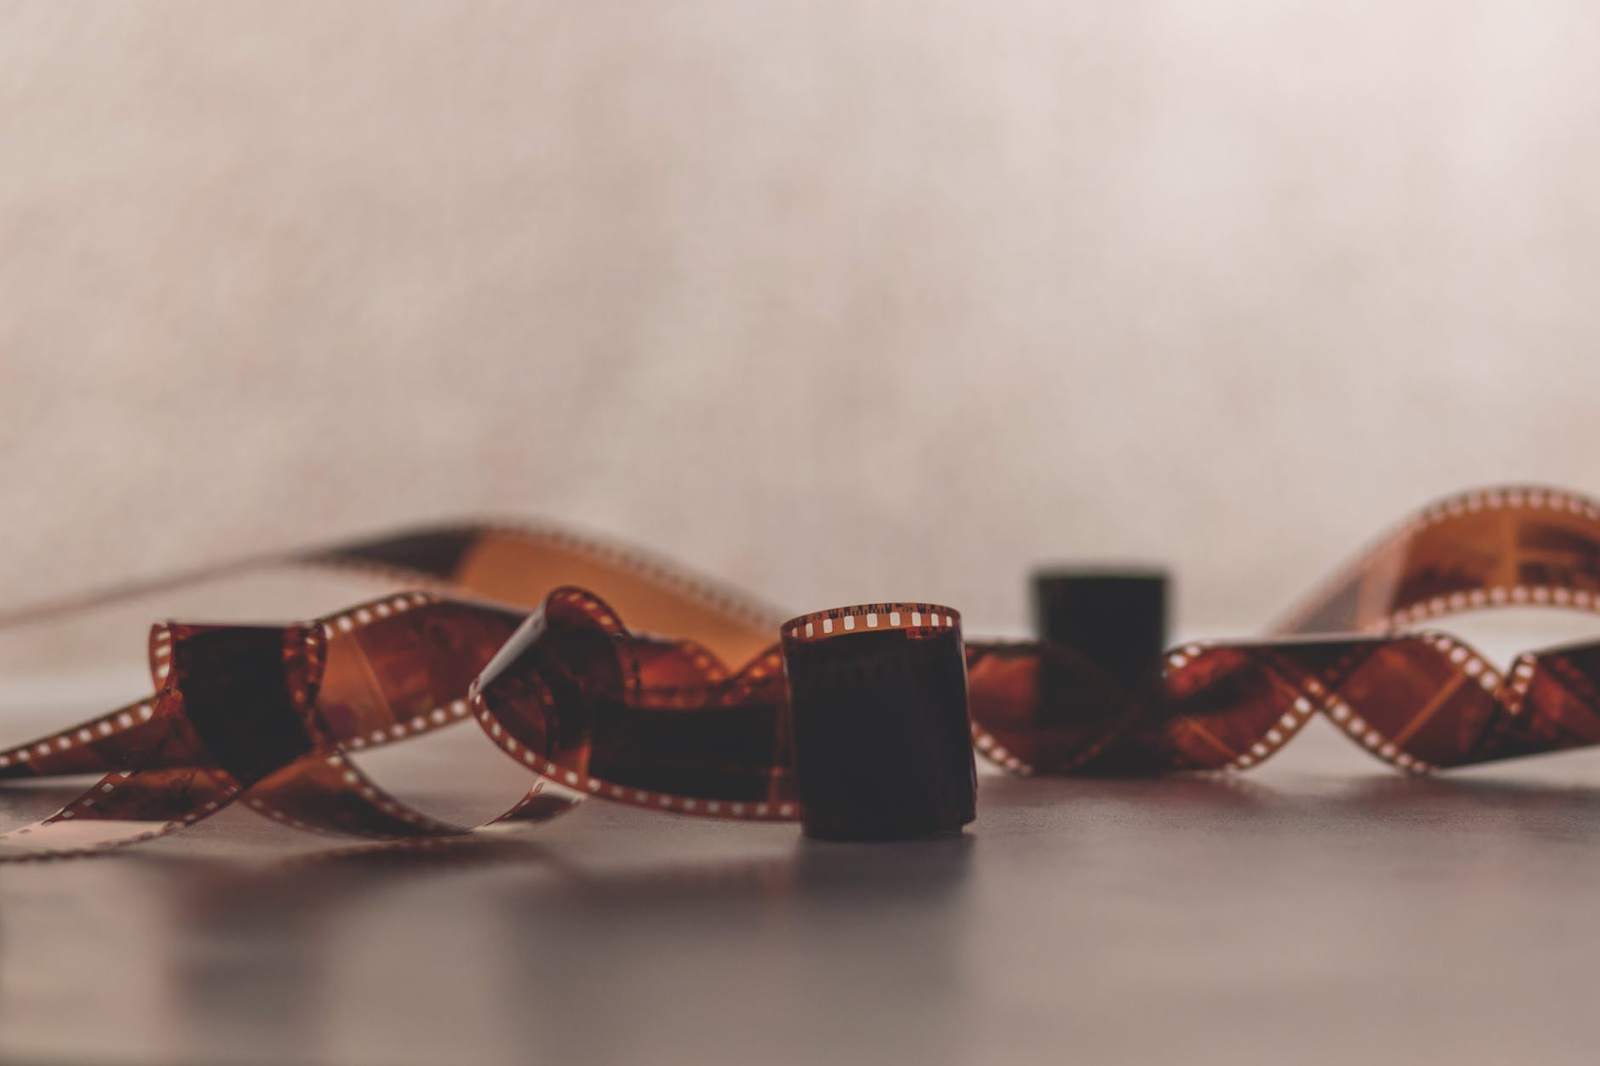 Art of Developing Film